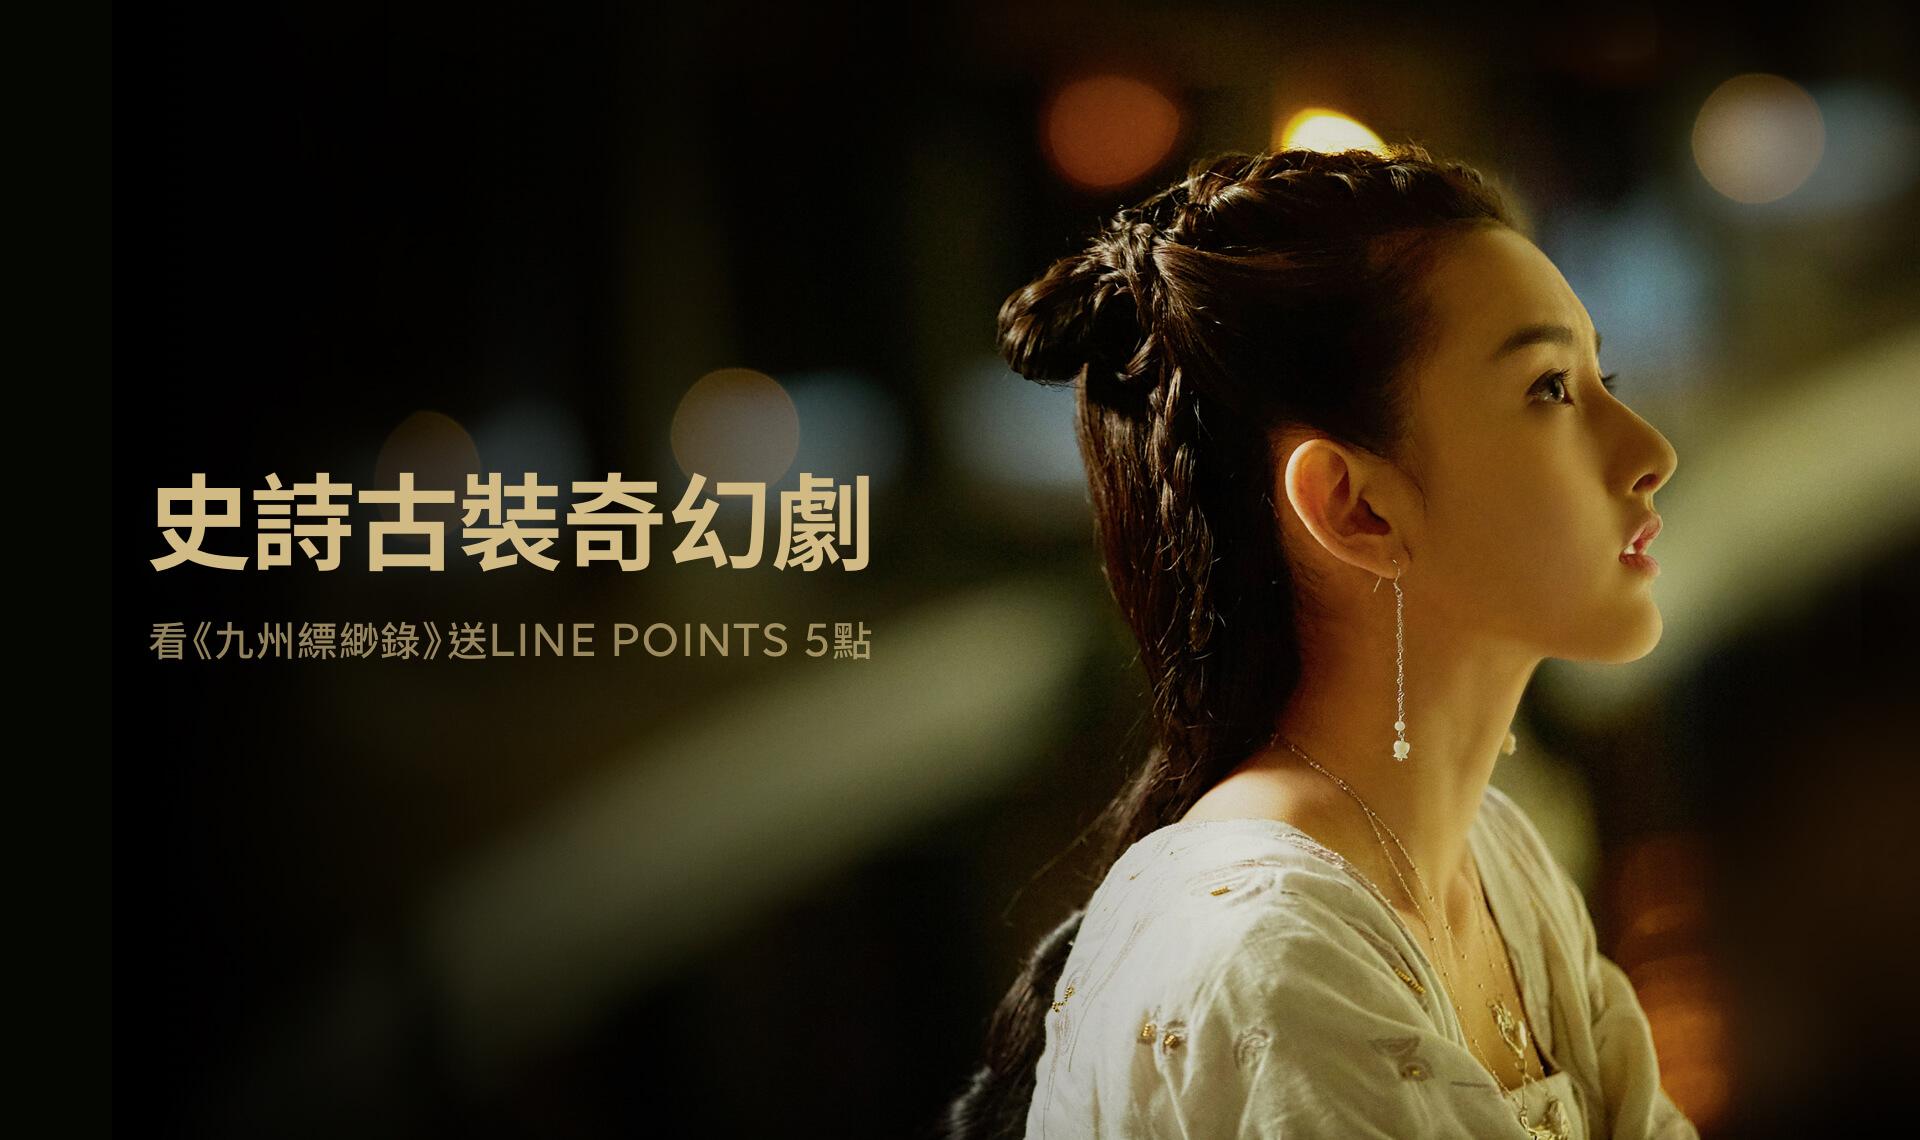 【LINE TV限時贈點活動】觀看《九州縹緲錄》就送LINE POINTS!